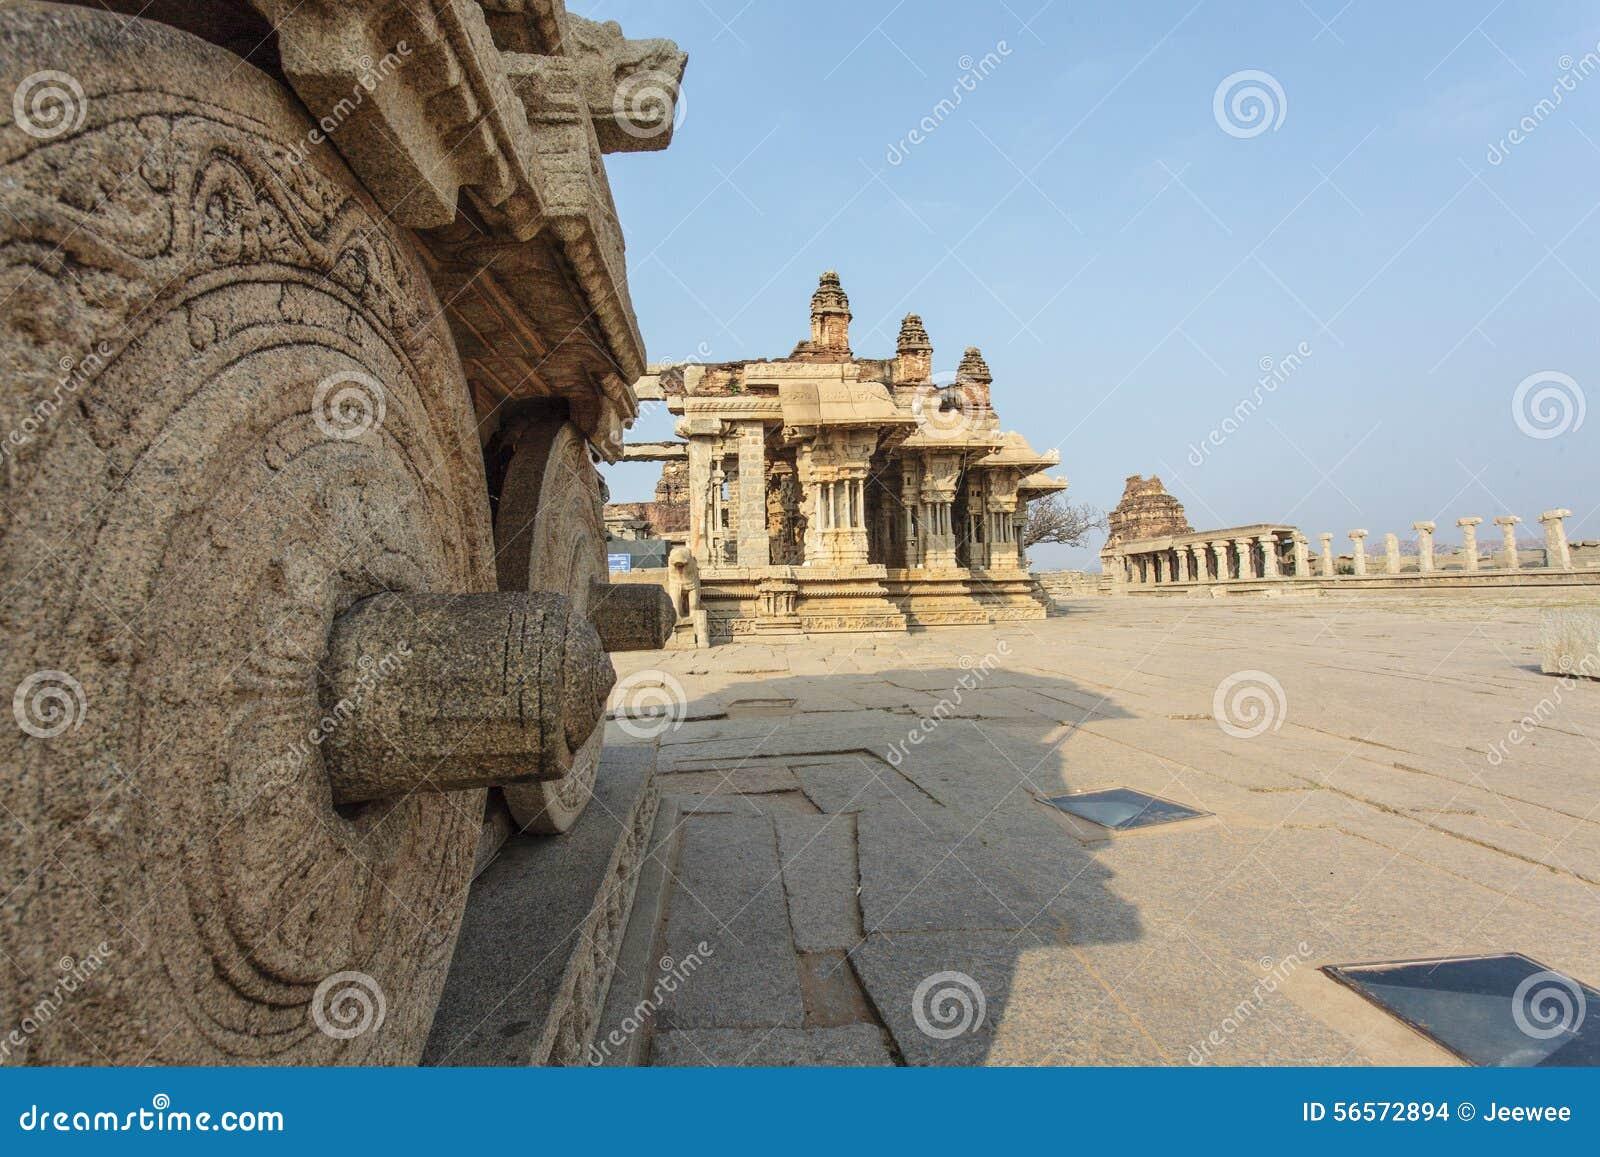 Download Οι πλούσιοι χάρασαν το άρμα πετρών μέσα στον ινδό ναό Vittala στην αρχαία περιοχή Hampi, Karnataka, Ινδία Στοκ Εικόνες - εικόνα από μέσα, ήλιος: 56572894